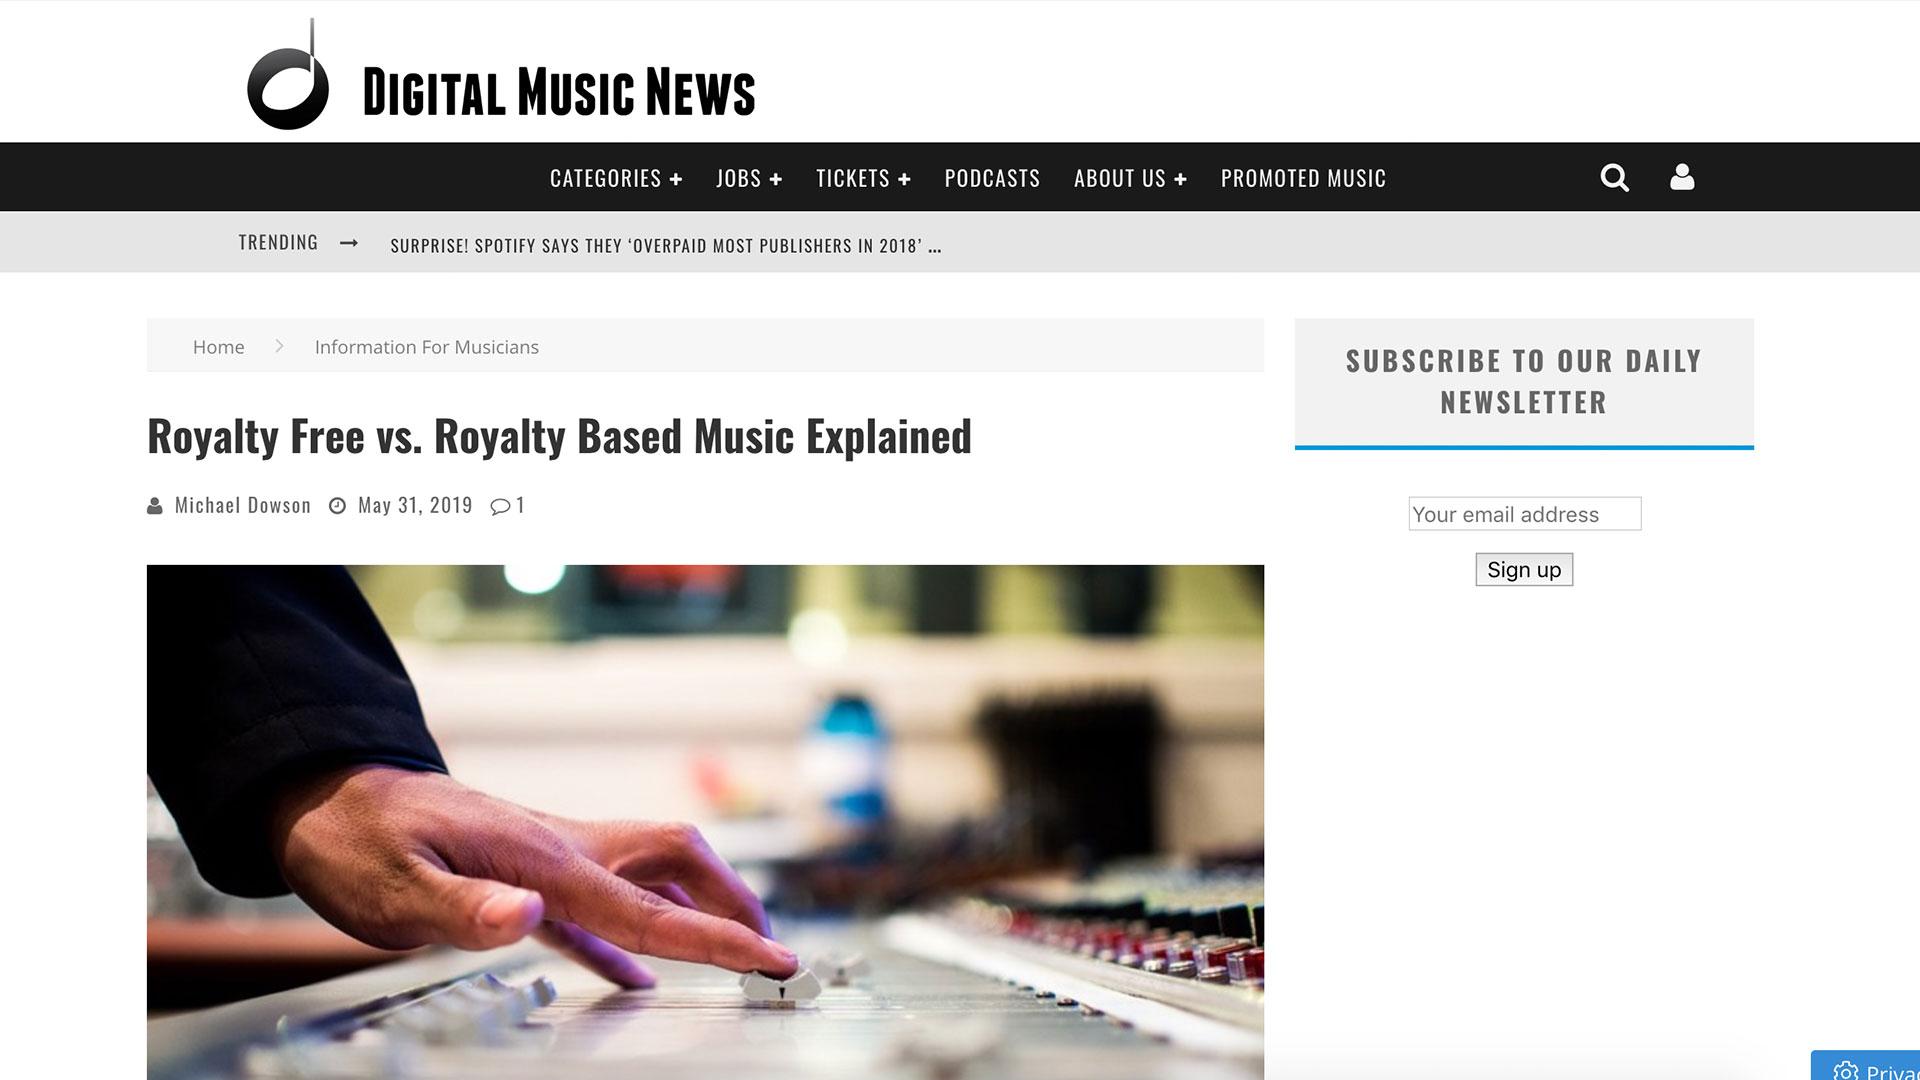 Fairness Rocks News Royalty Free vs. Royalty Based Music Explained